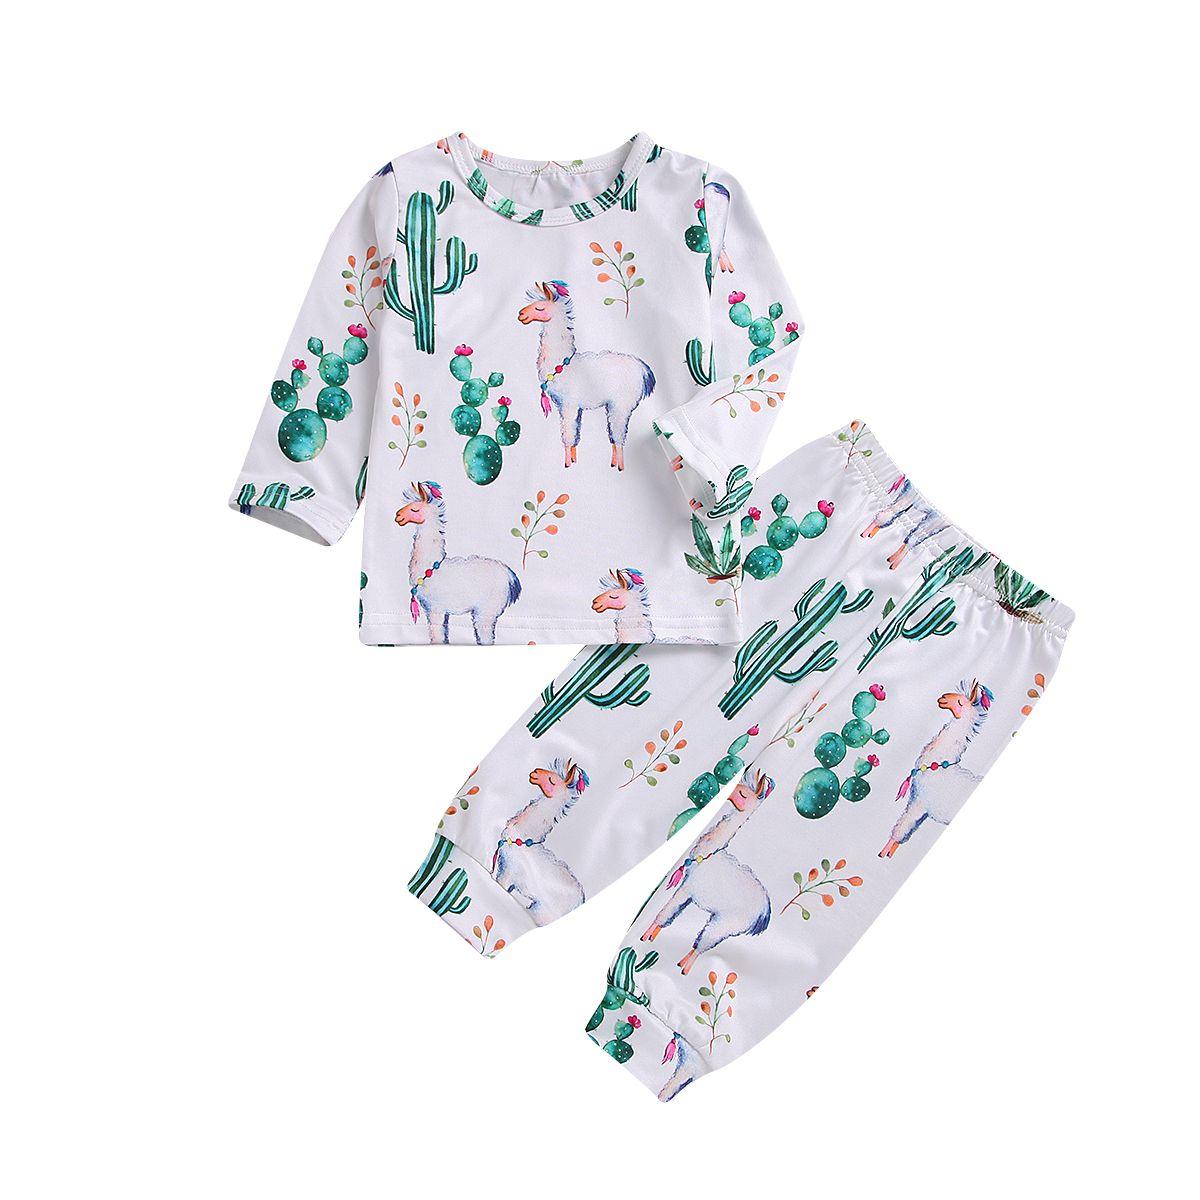 2fcf7c913d6e Llama Cactus Cartoon Infant Baby Clothing Set Boys Girls Unisex Pajamas  Long Sleeve Top+Pants Outfits Baby Clothes 0 24M Kid Boutique Boys In  Pajamas Girls ...